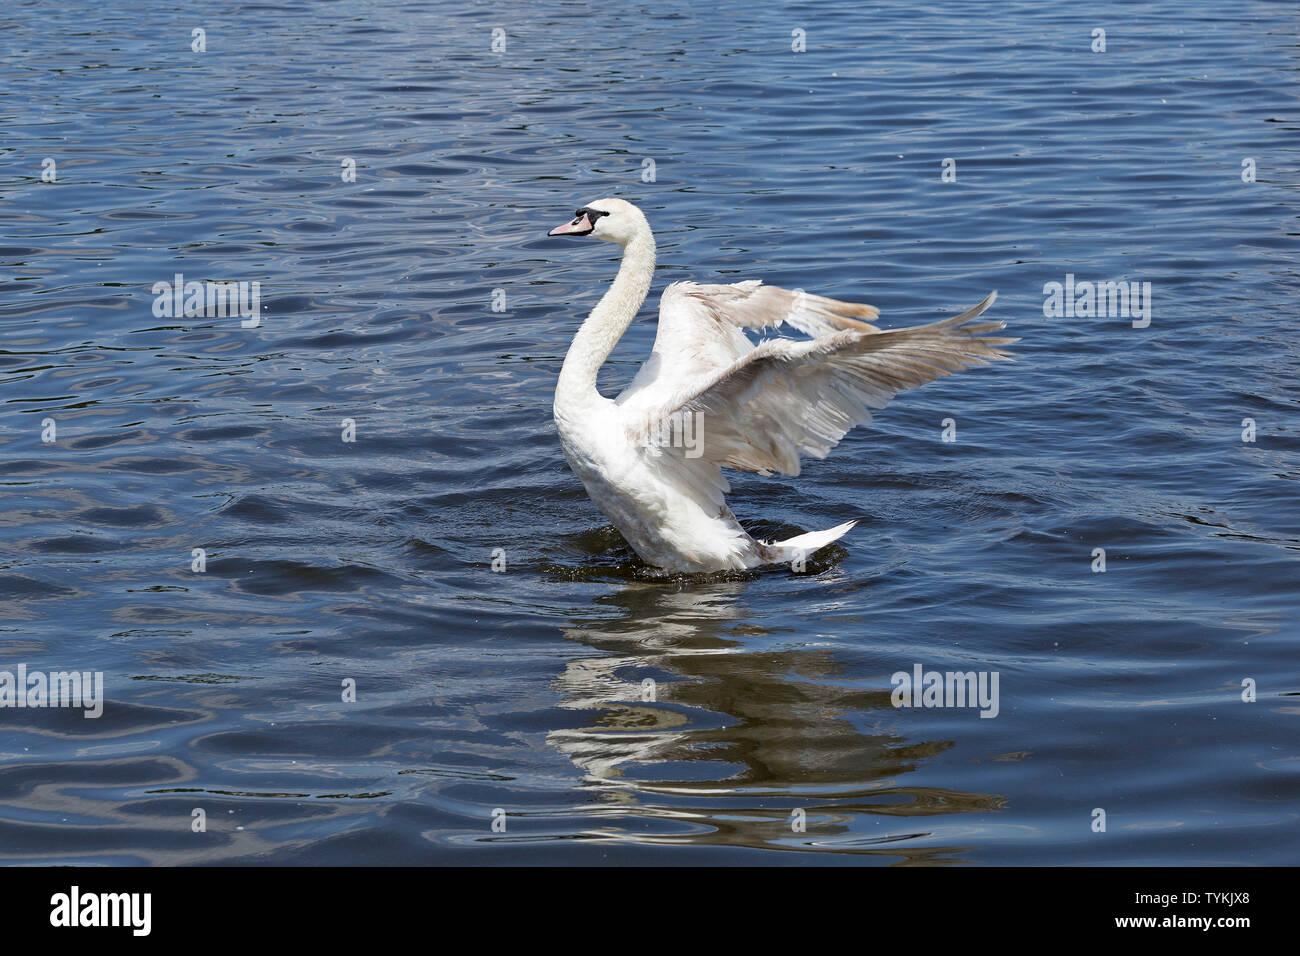 mute swan (Cygnus olor) spreading its wings, Inner Alster, Hamburg, Germany Stock Photo